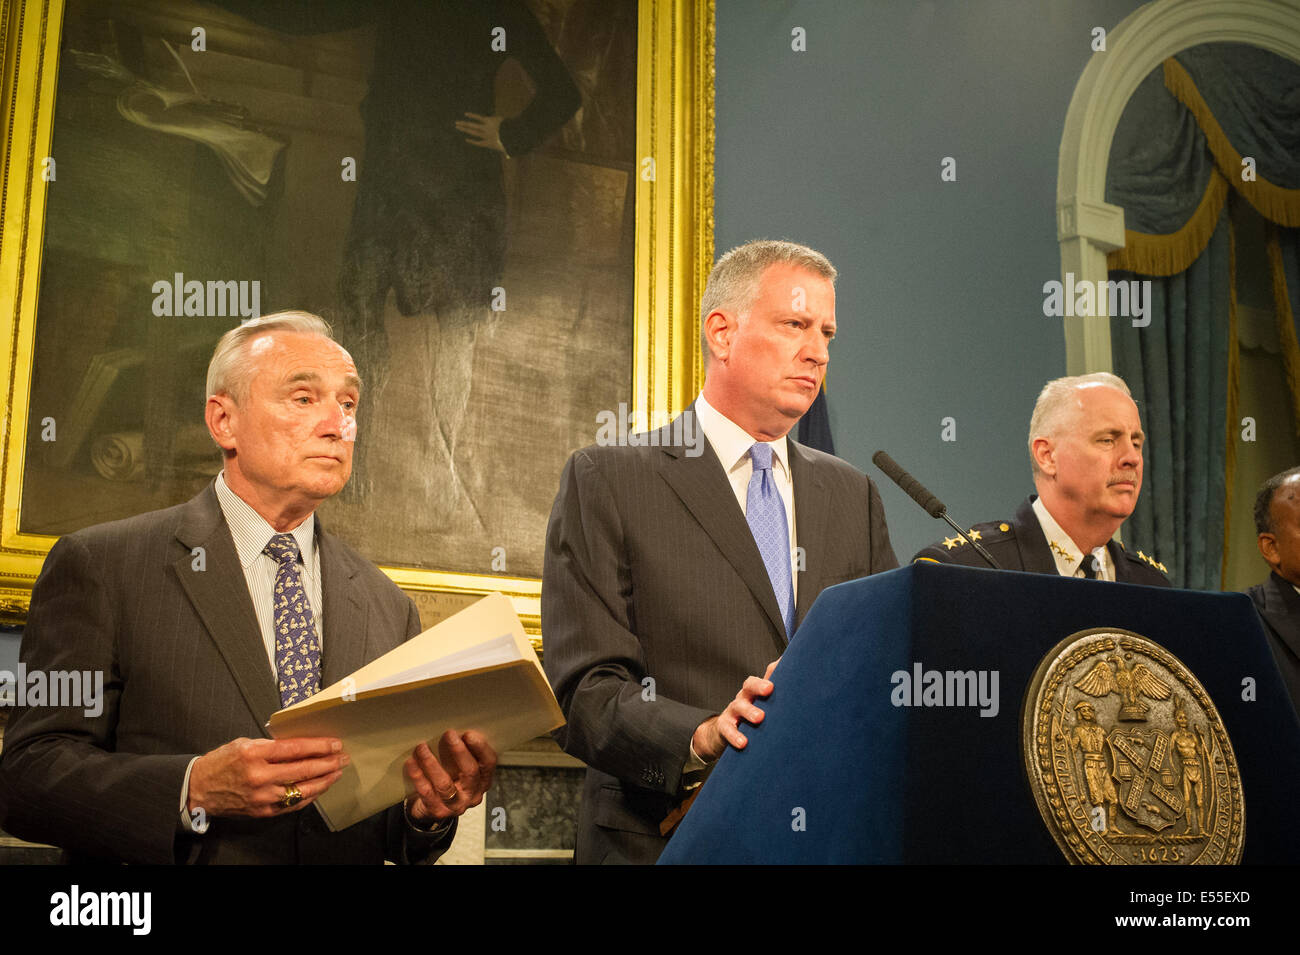 New York Mayor Bill De Blasio, center, and NYPD Commissioner William Bratton, left, speak at a press conference - Stock Image